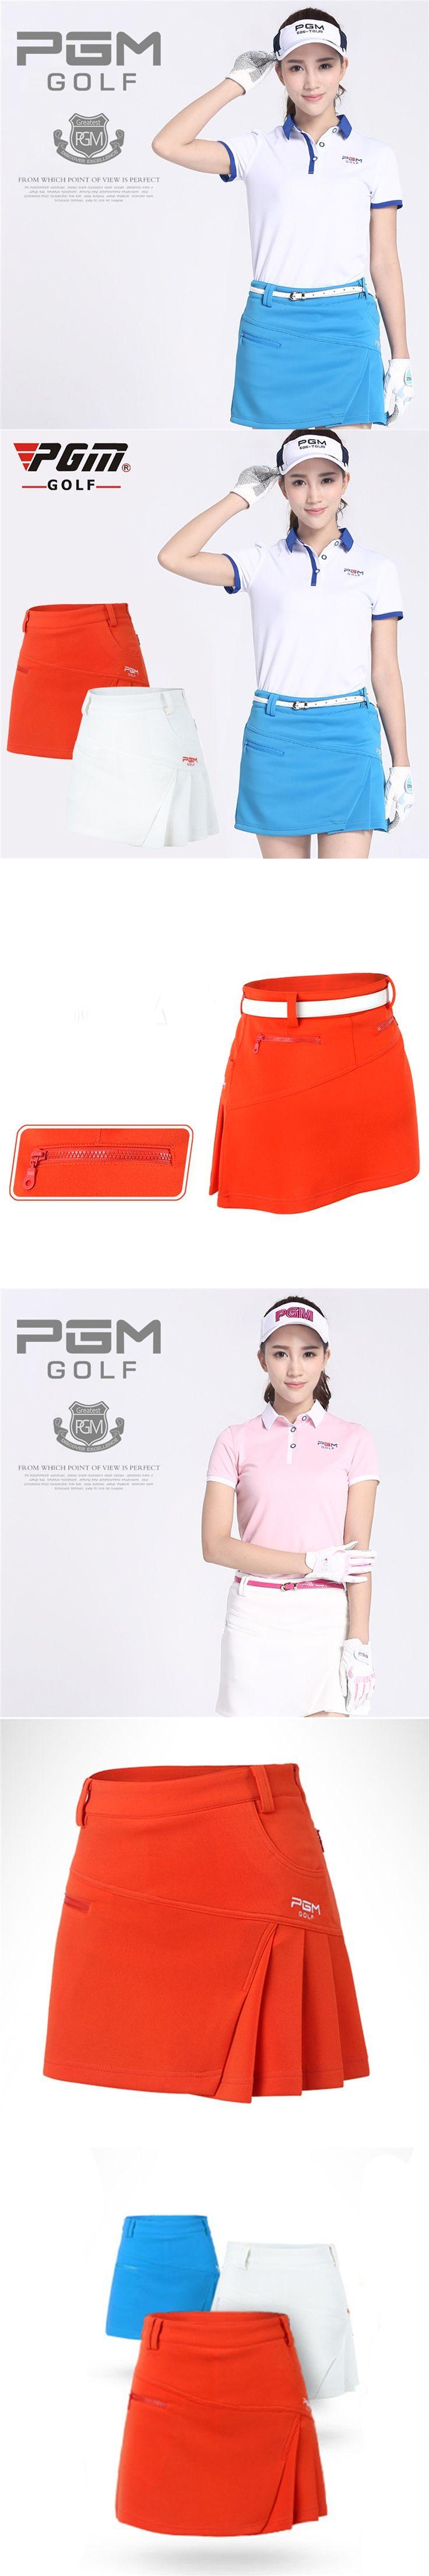 PGM Brand Womens Golf Short Solid Color Skirt Dress Shorts Pants Kilt Golf Clothing Quick Dry Skirts Sportswear 3 Colors 5 Sizes